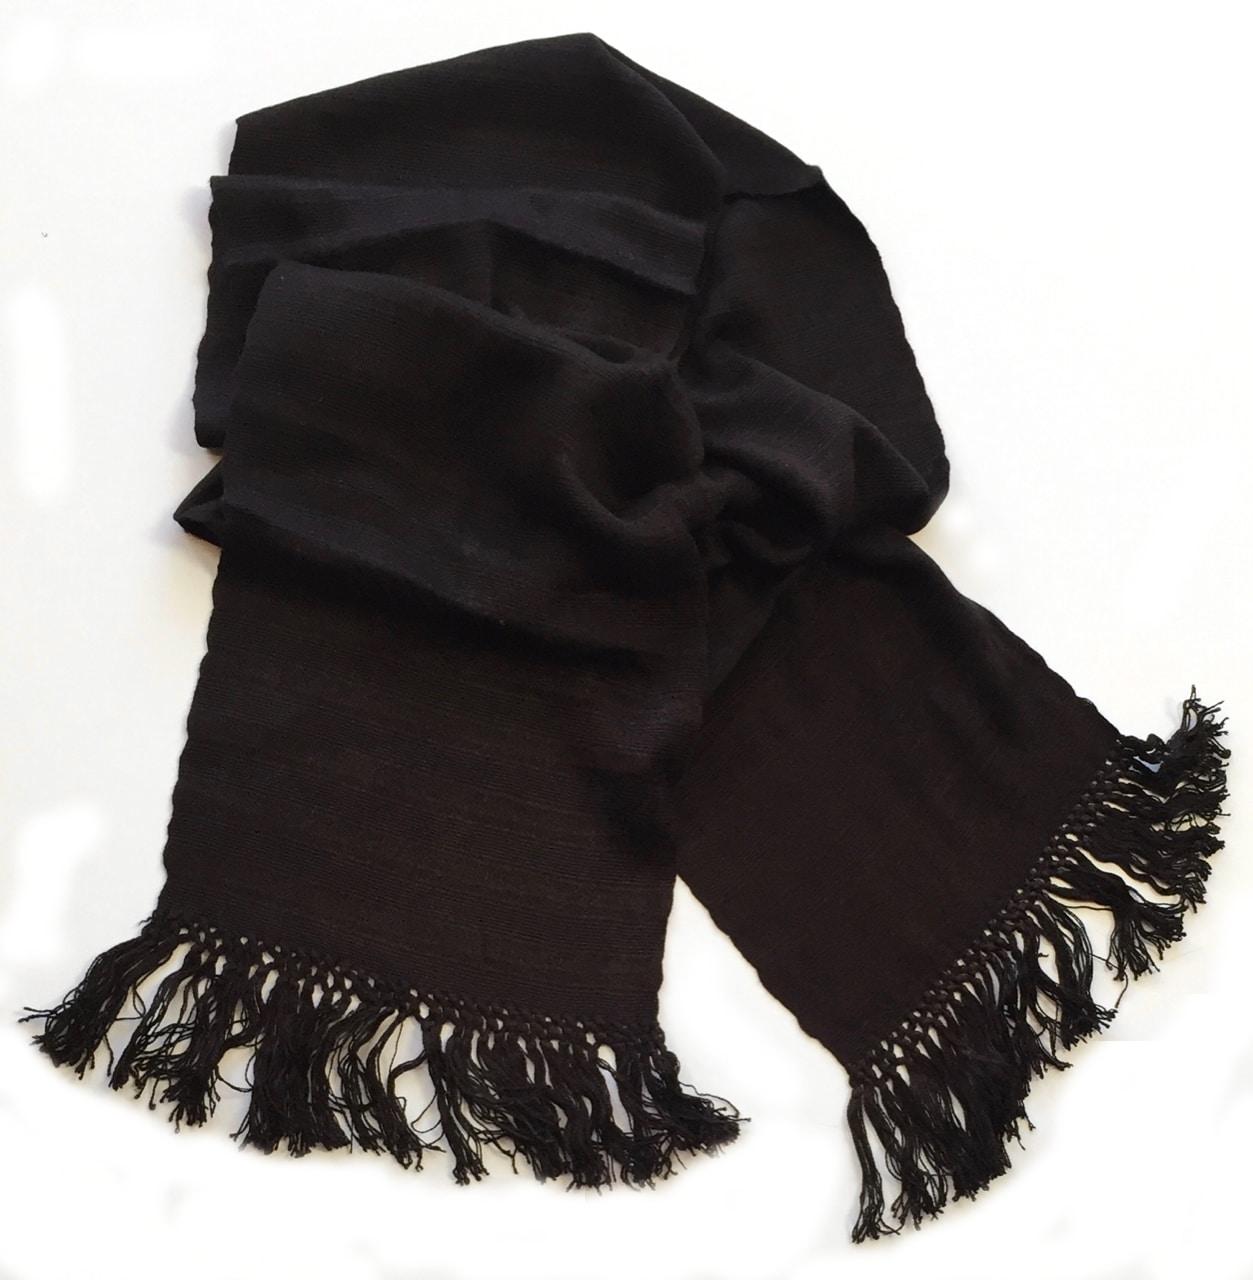 Black - Lightweight Bamboo Open-Weave Handwoven Scarf 8 x 68